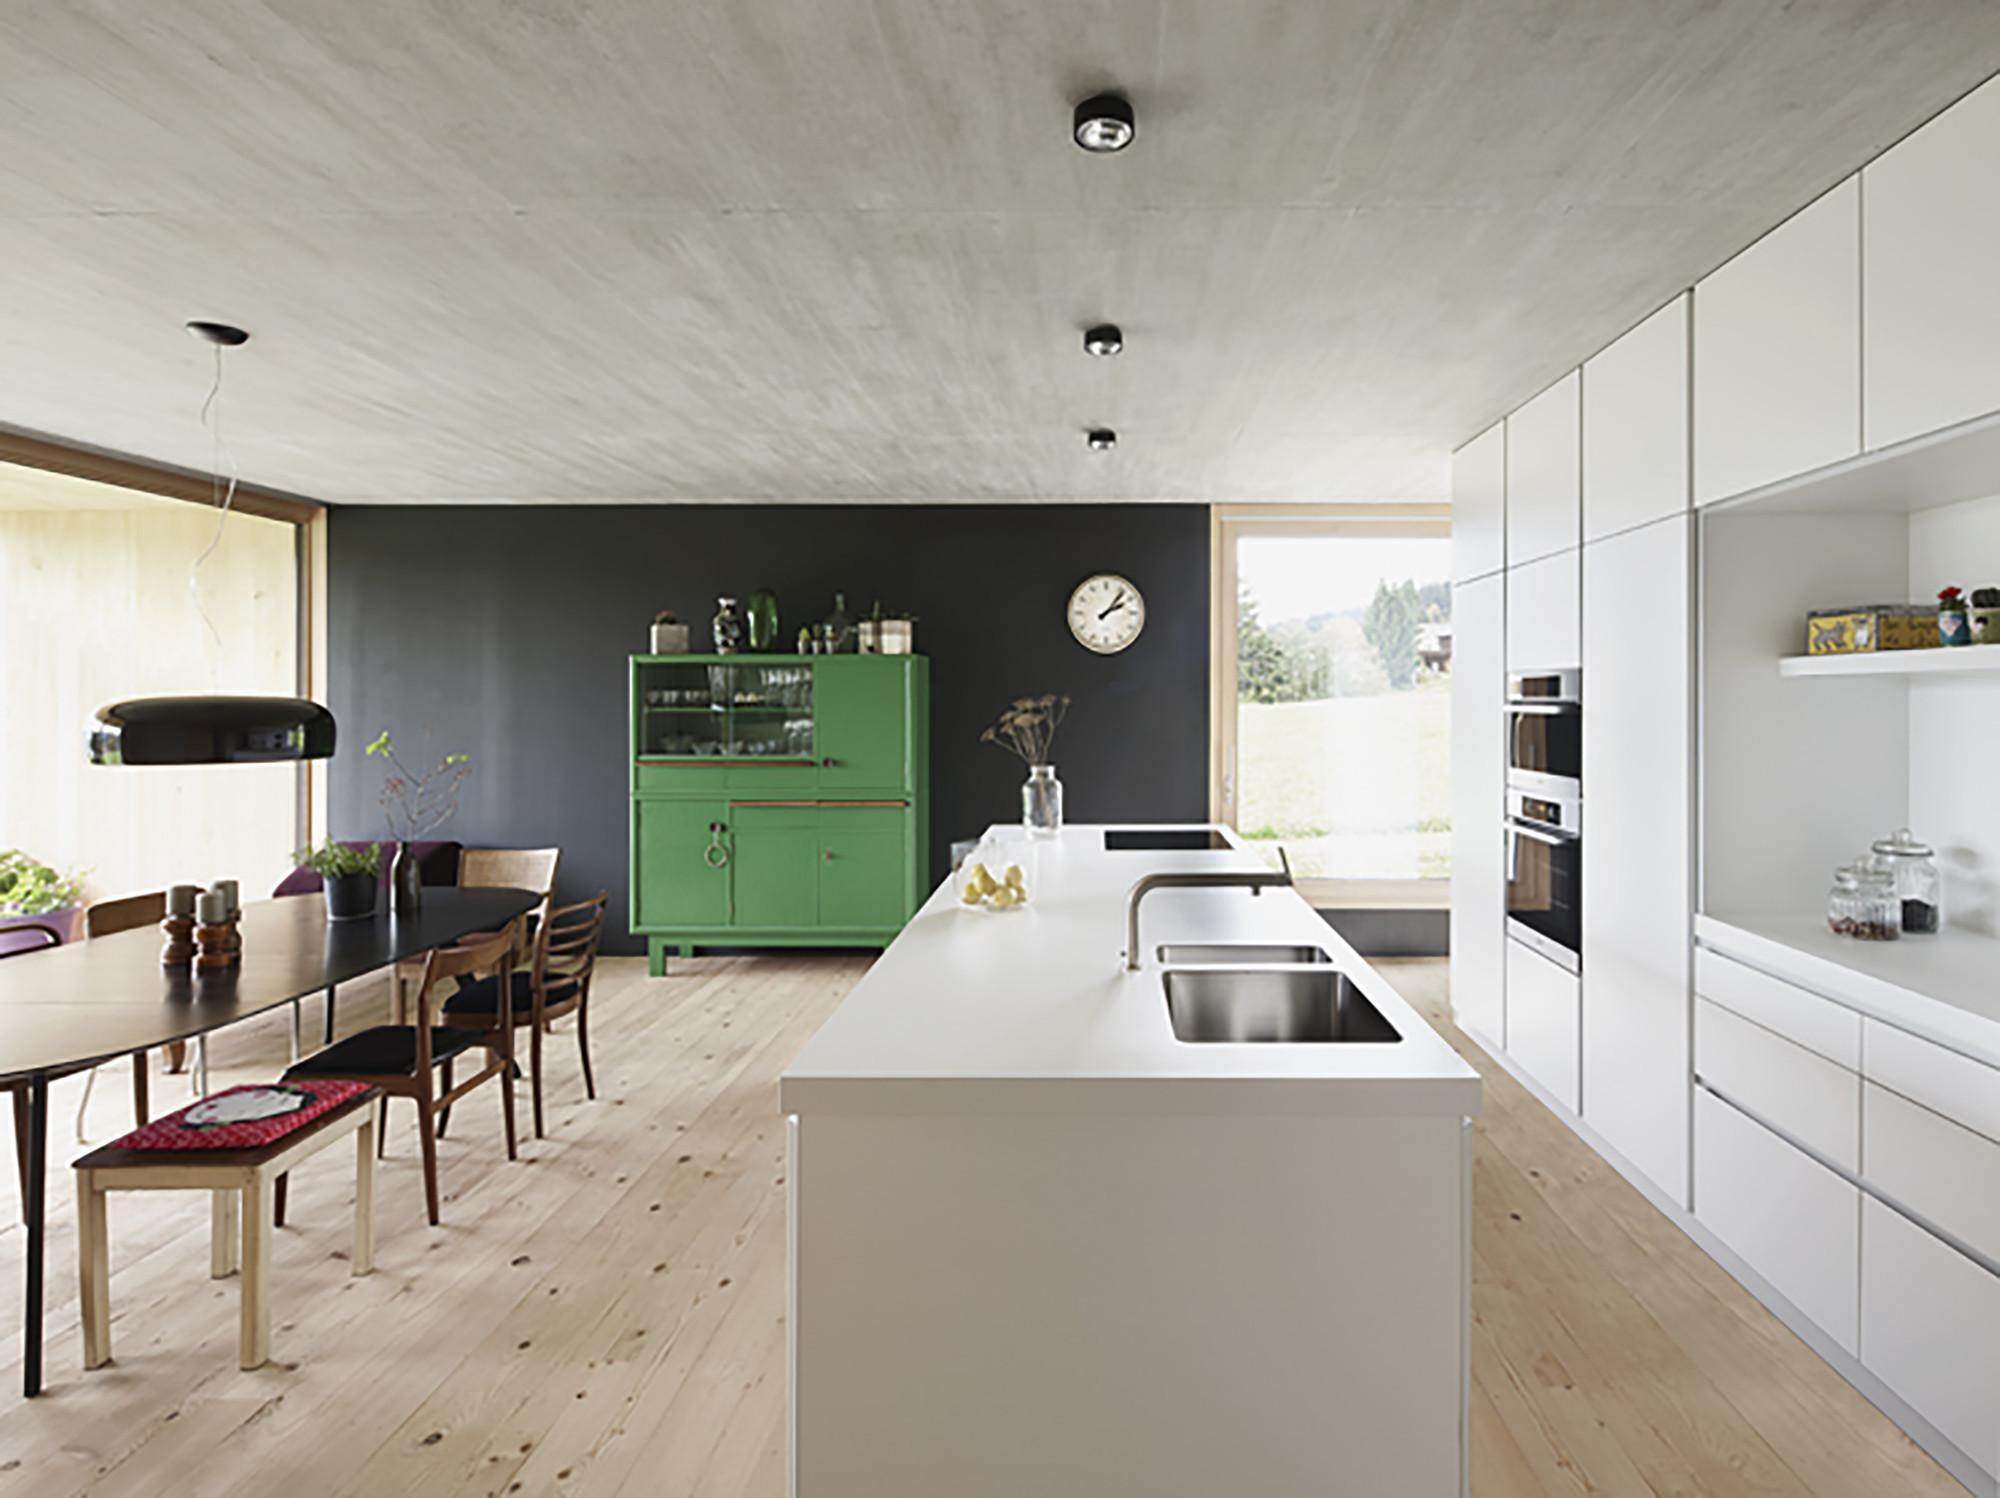 haus kaltschmieden bernardo bader architects archdaily. Black Bedroom Furniture Sets. Home Design Ideas